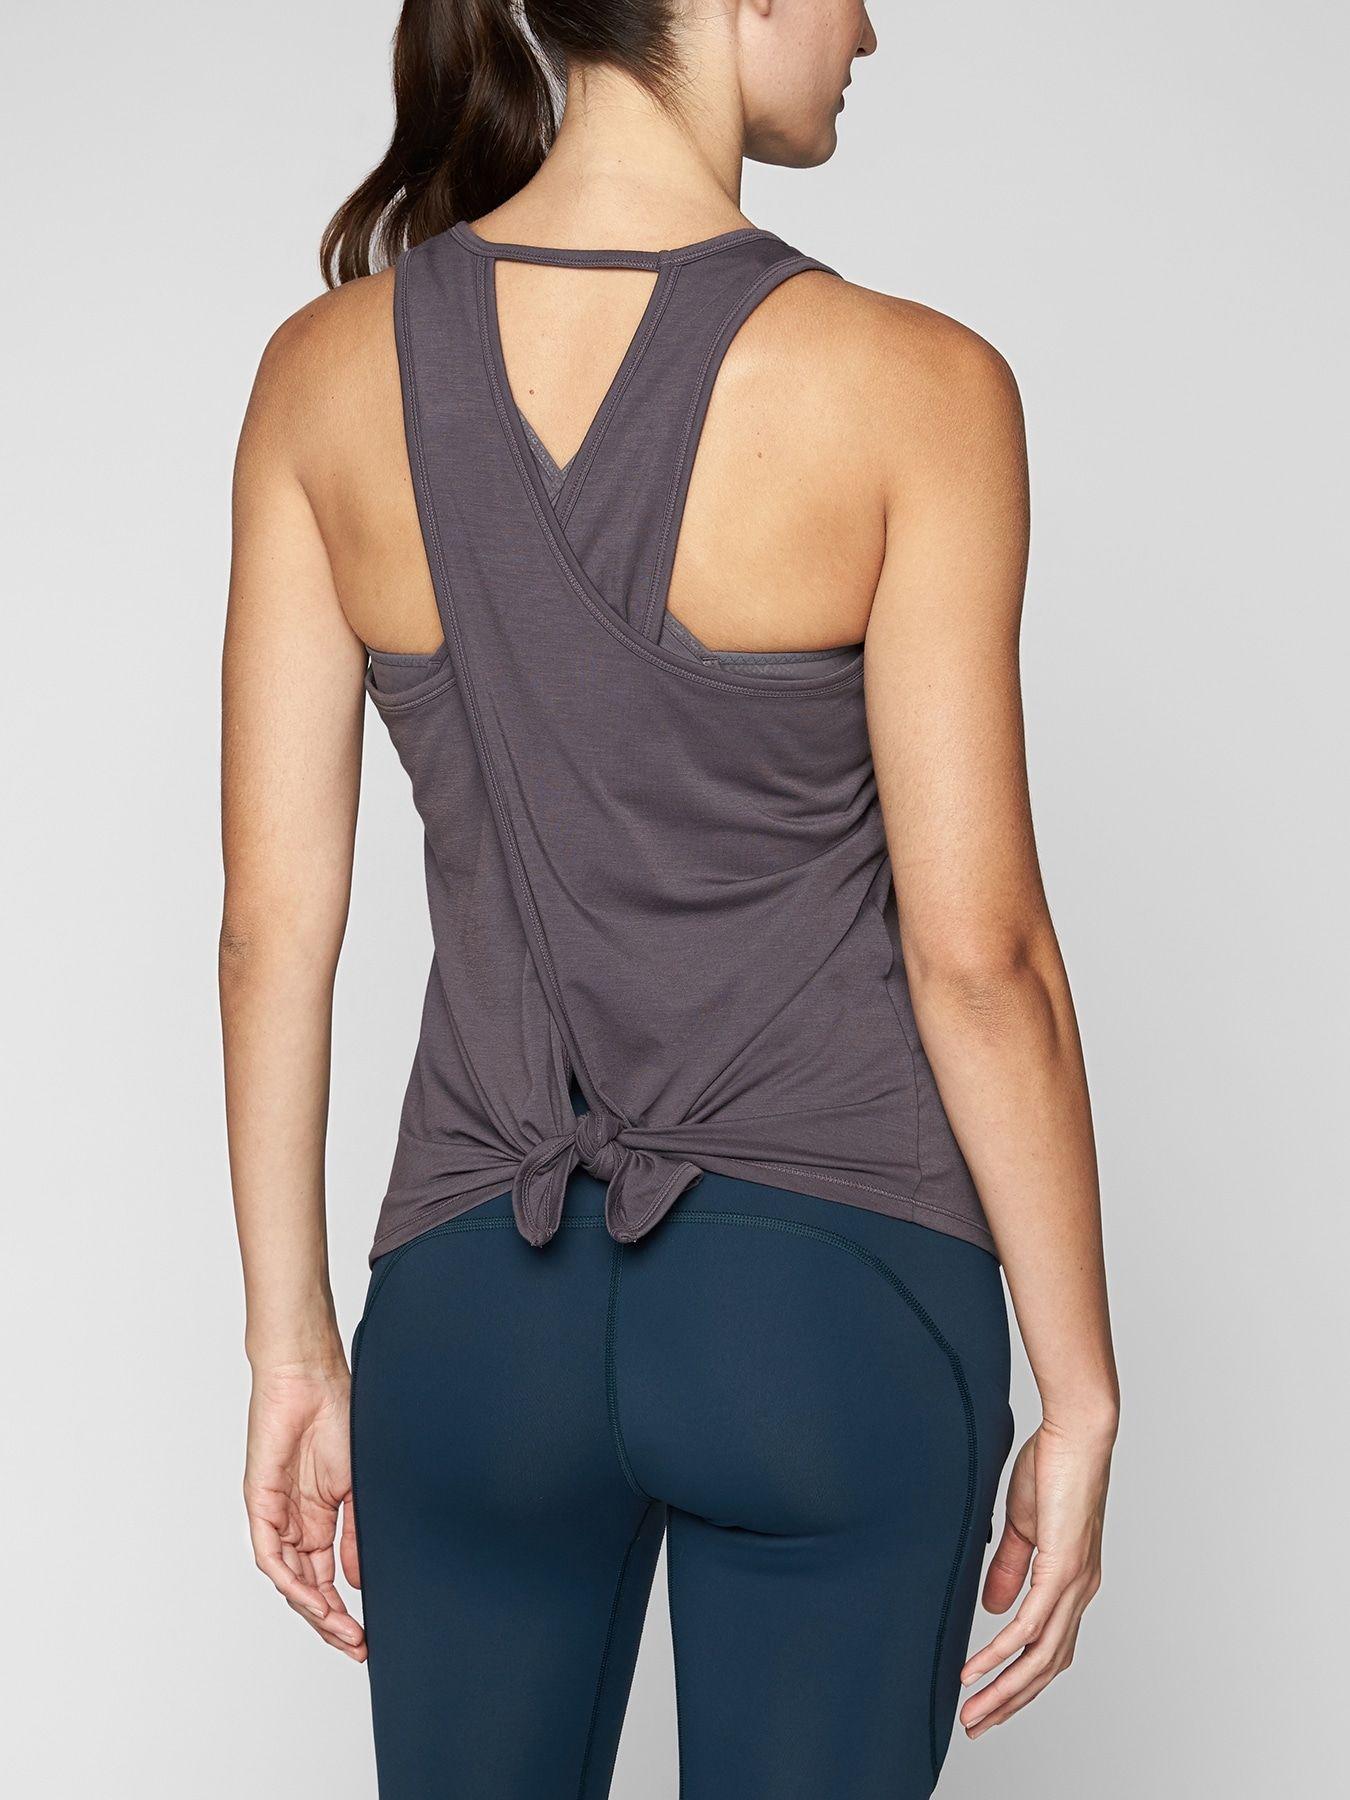 Athleta Essence Tie Back Tank Workout tops for women